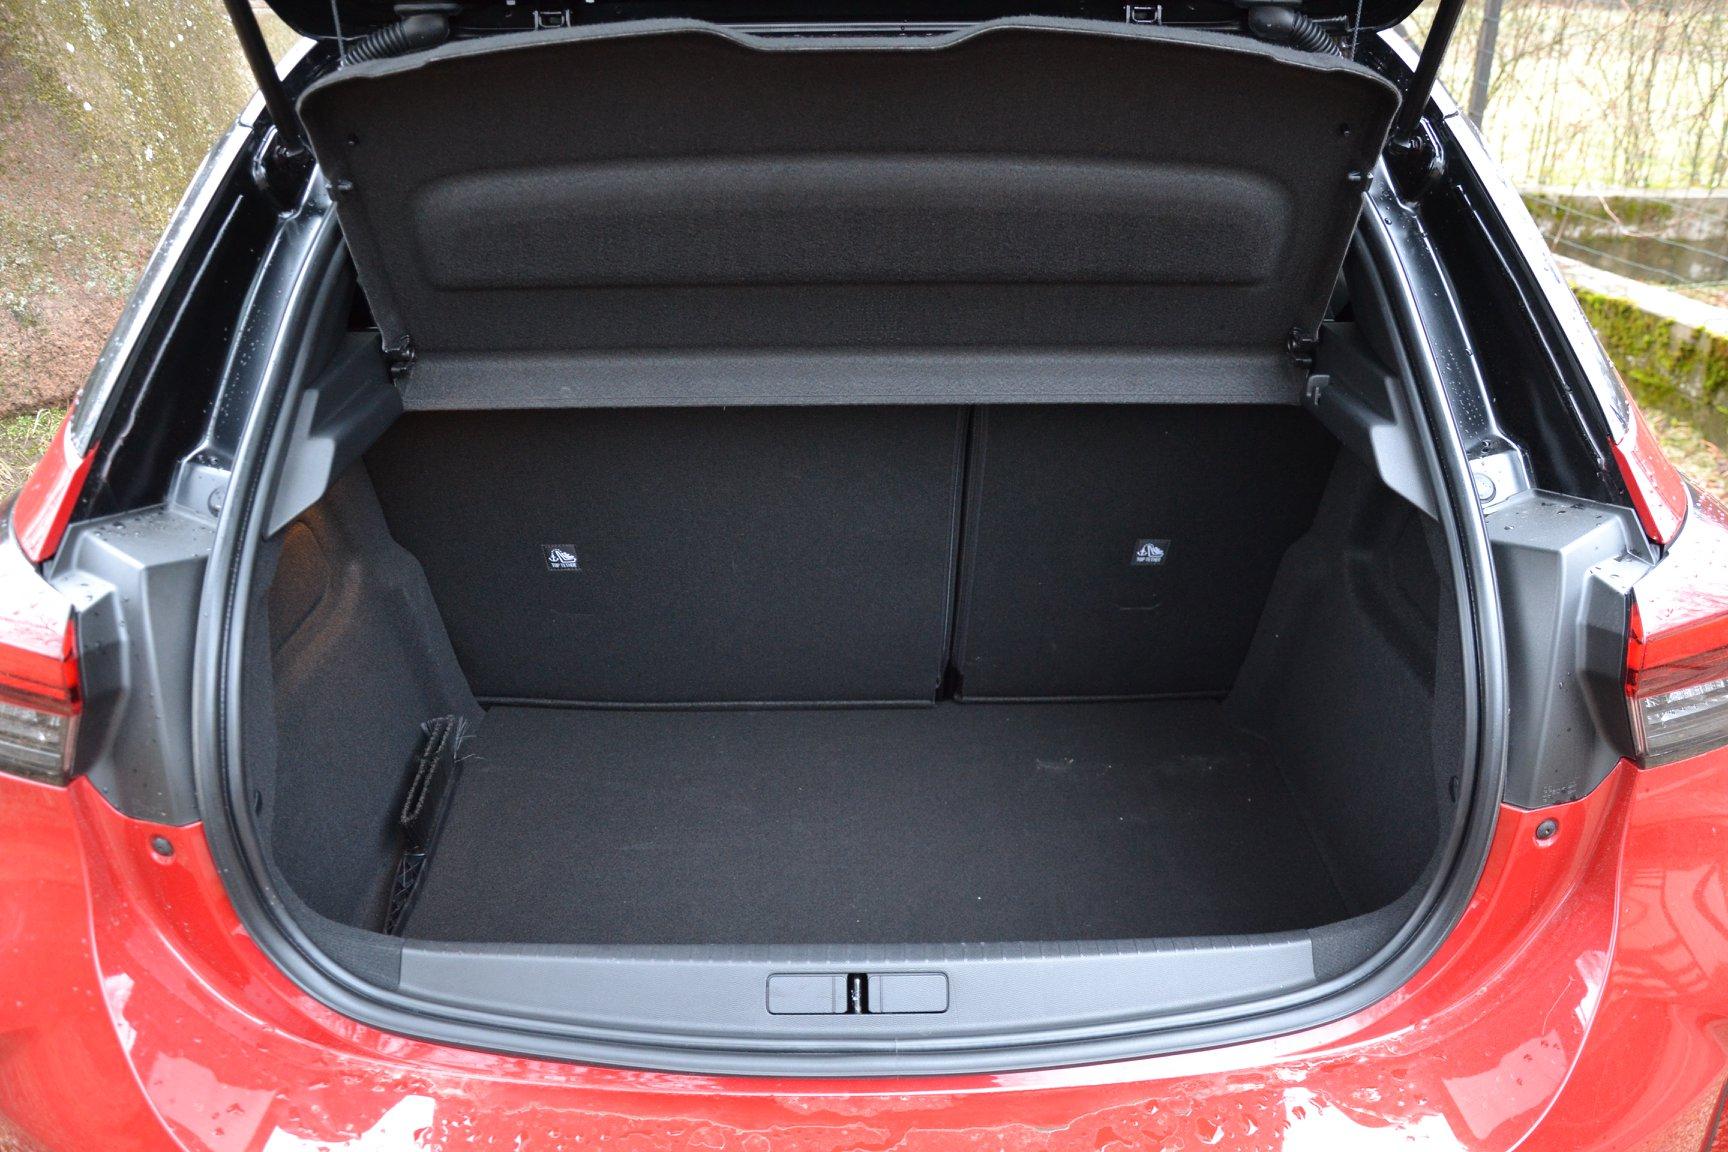 https://www.whatcar.lv/cars/Opel/Corsa/f6ed29760ff720b391c9cac786cb4da1.jpg